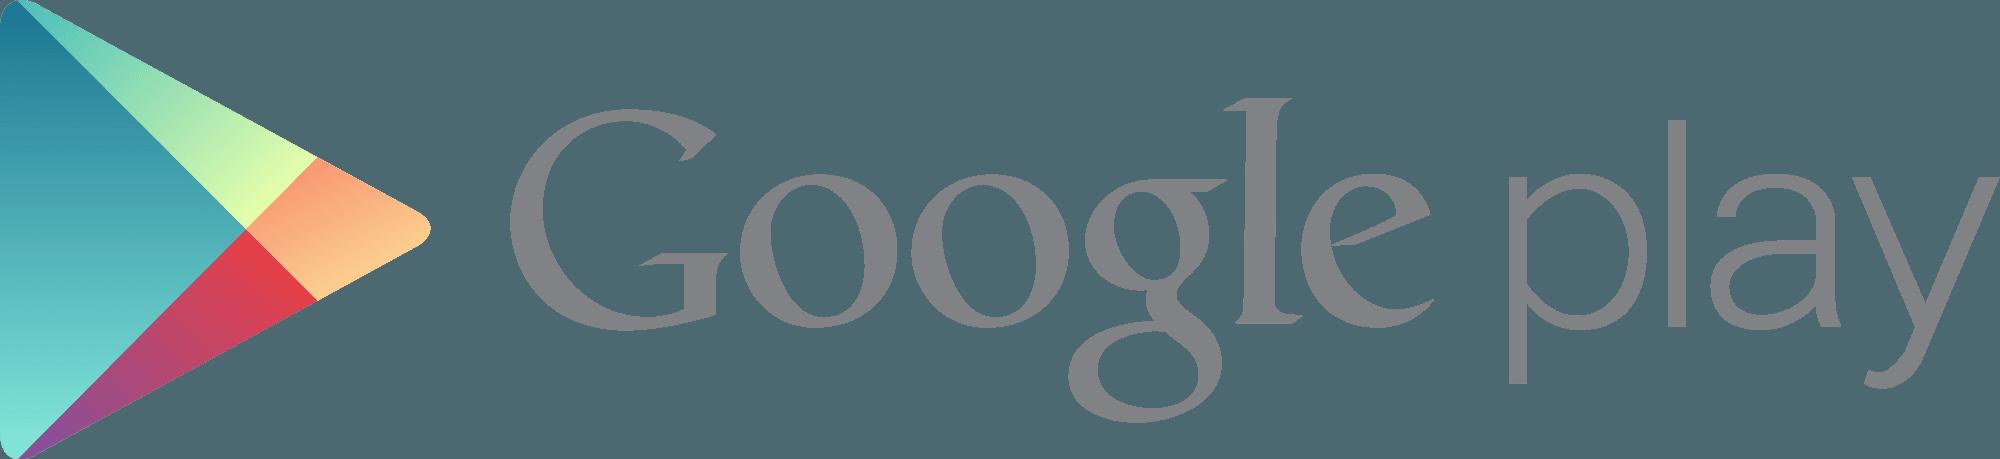 Google Play Store Sklep Play logo